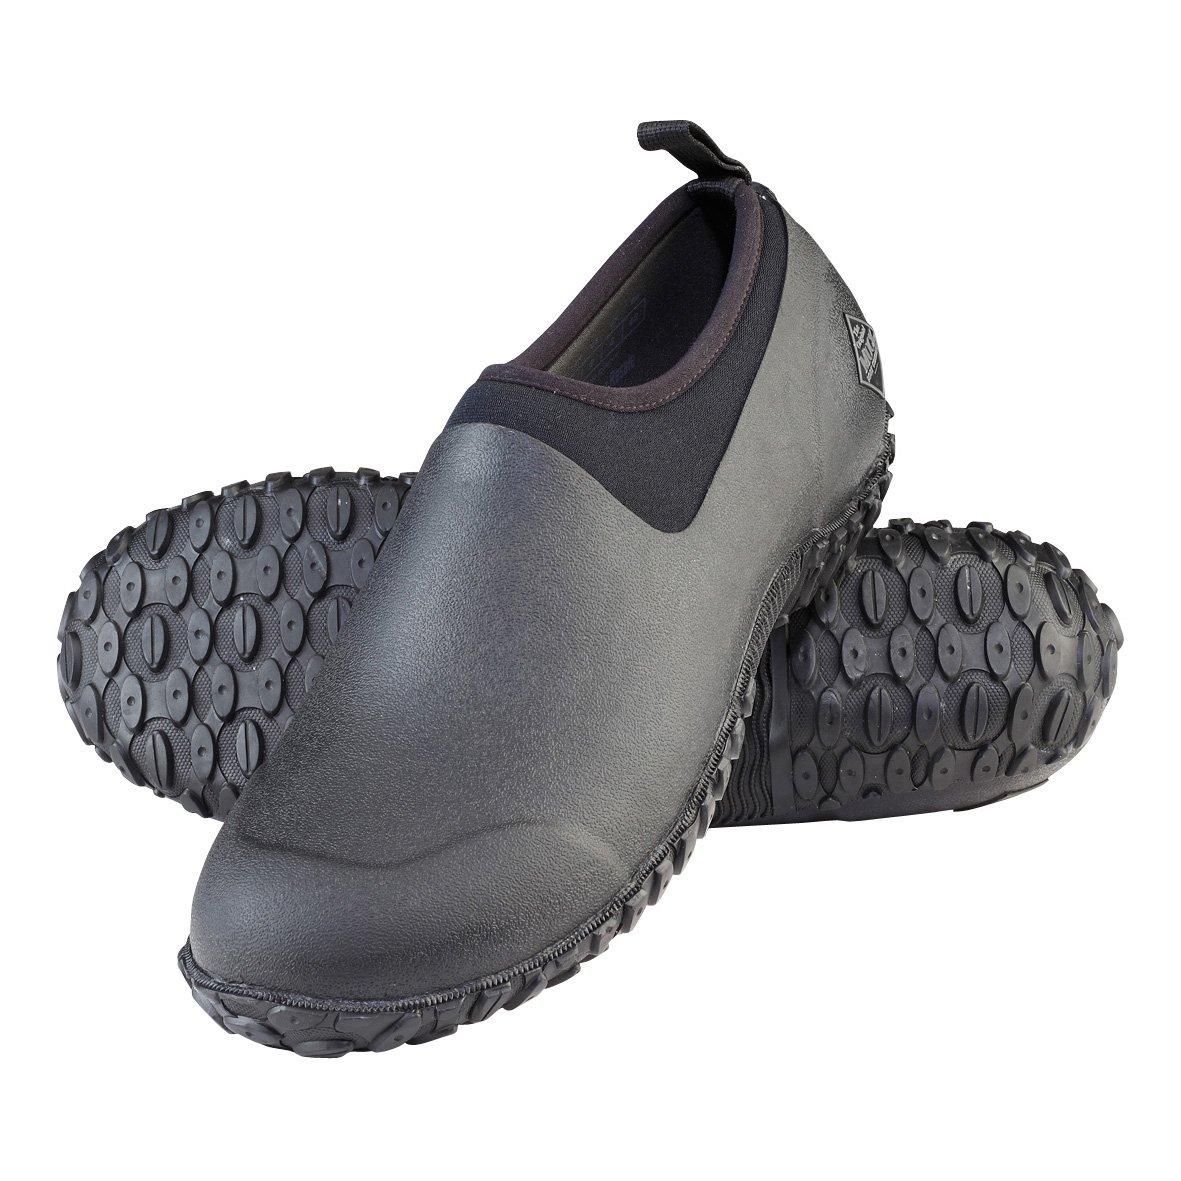 Muckster ll Men's Rubber Garden Shoes,black,9 US/9-9.5 M US by Muck Boot